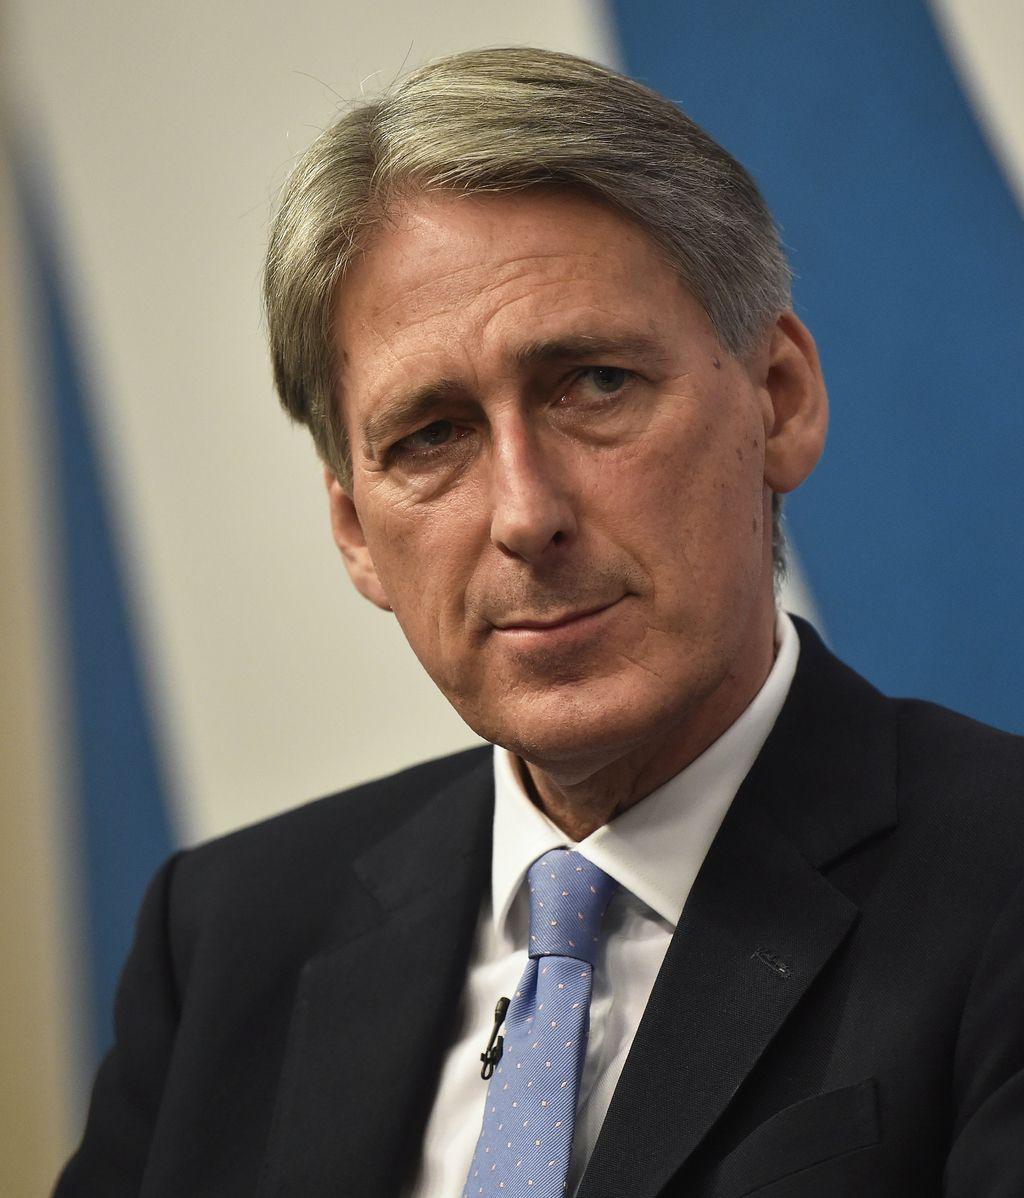 Philip Hammond, ministro de Exteriores de Reino Unido